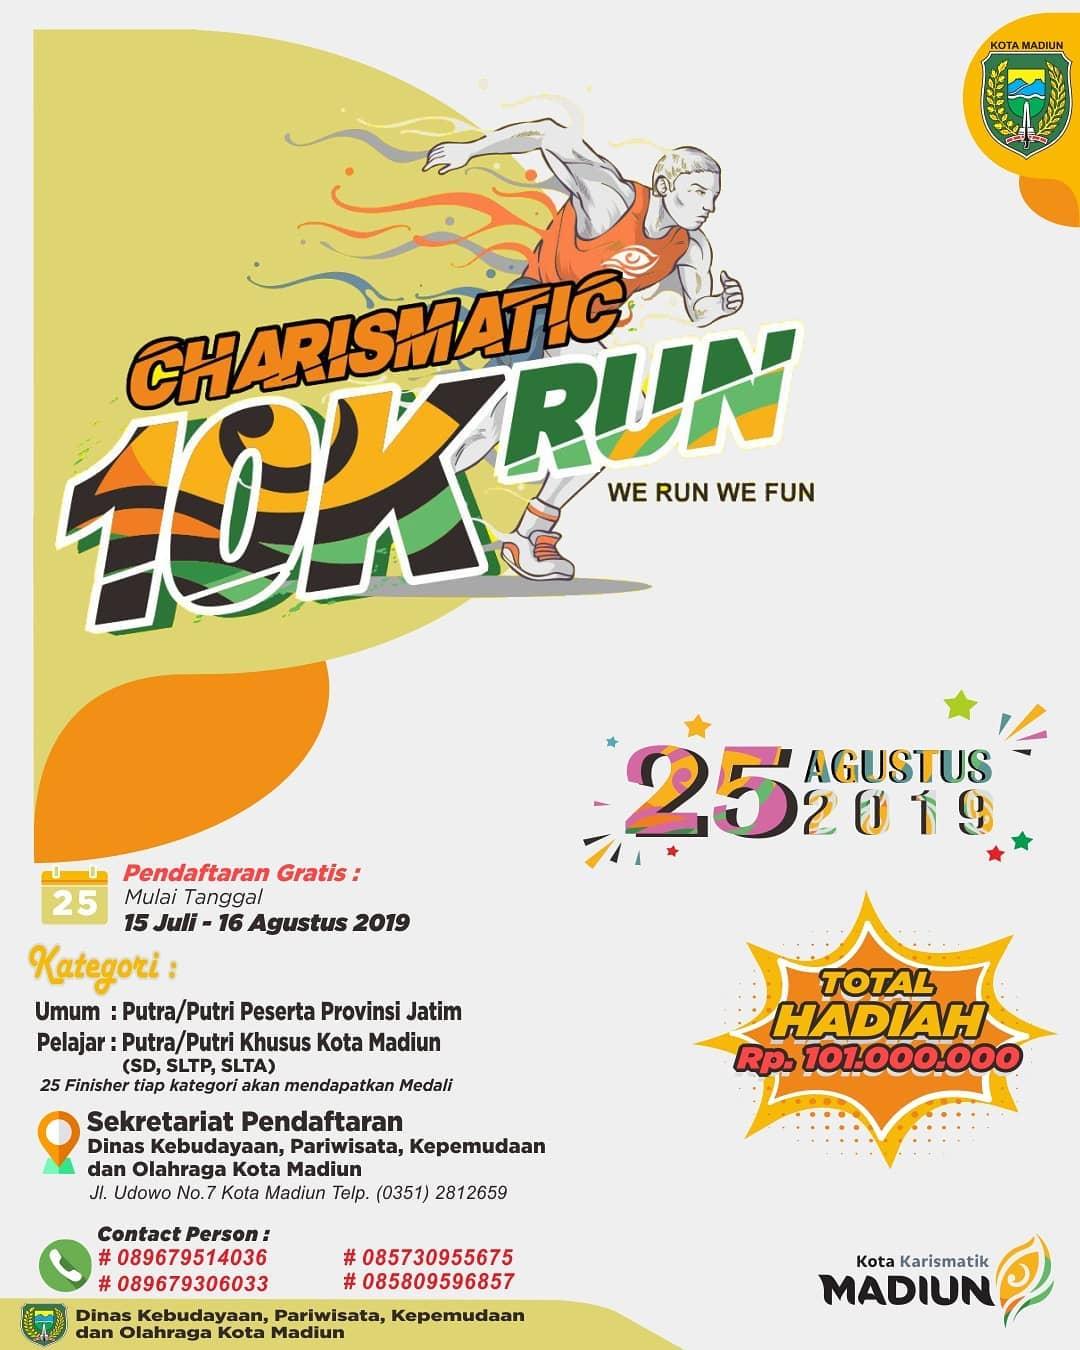 Charismatic 10K Run • 2019